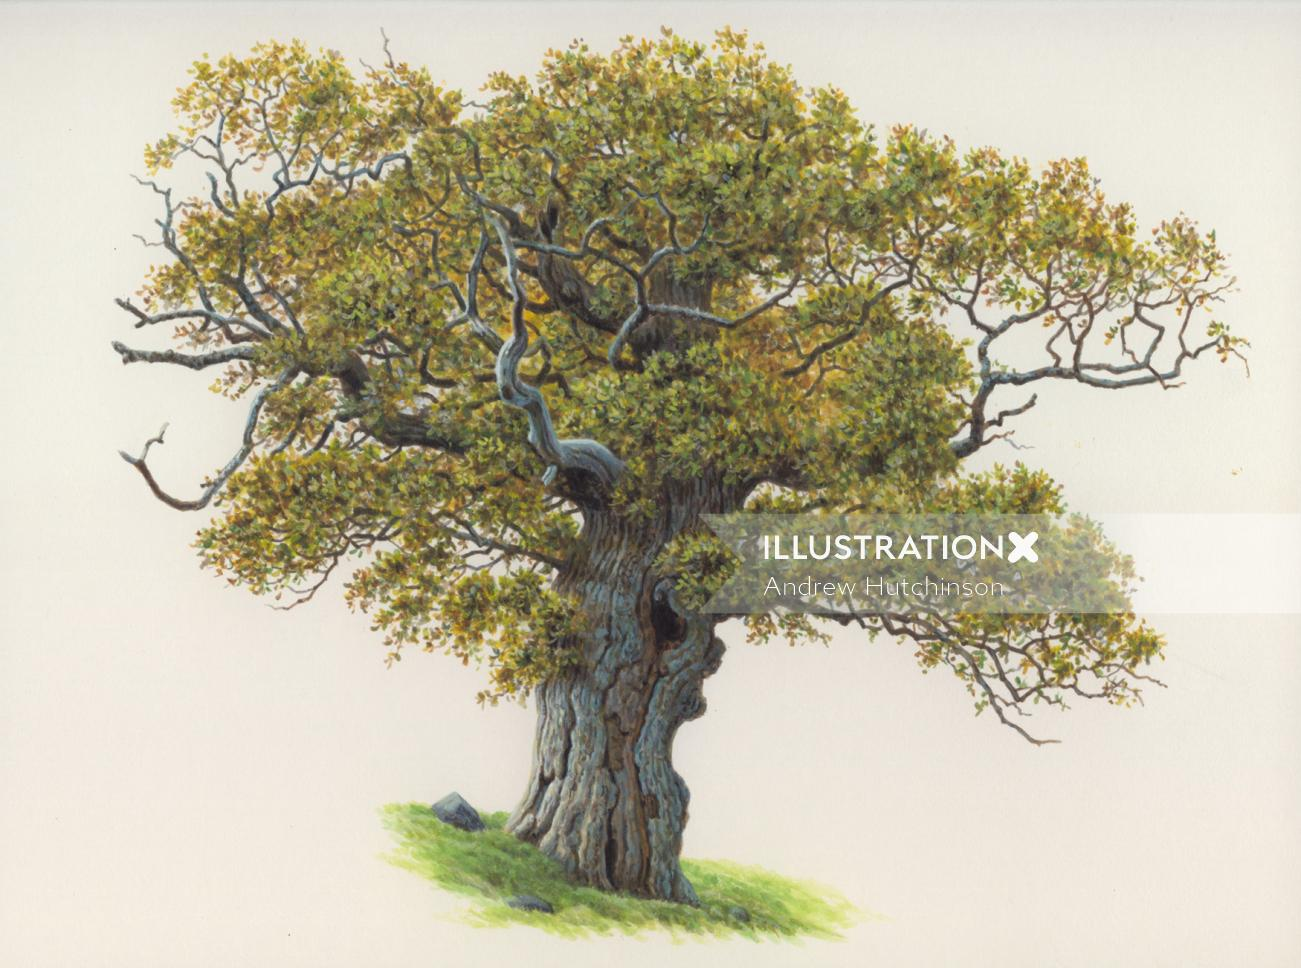 Oak acorn tree  illustration by Andrew Hutchinson